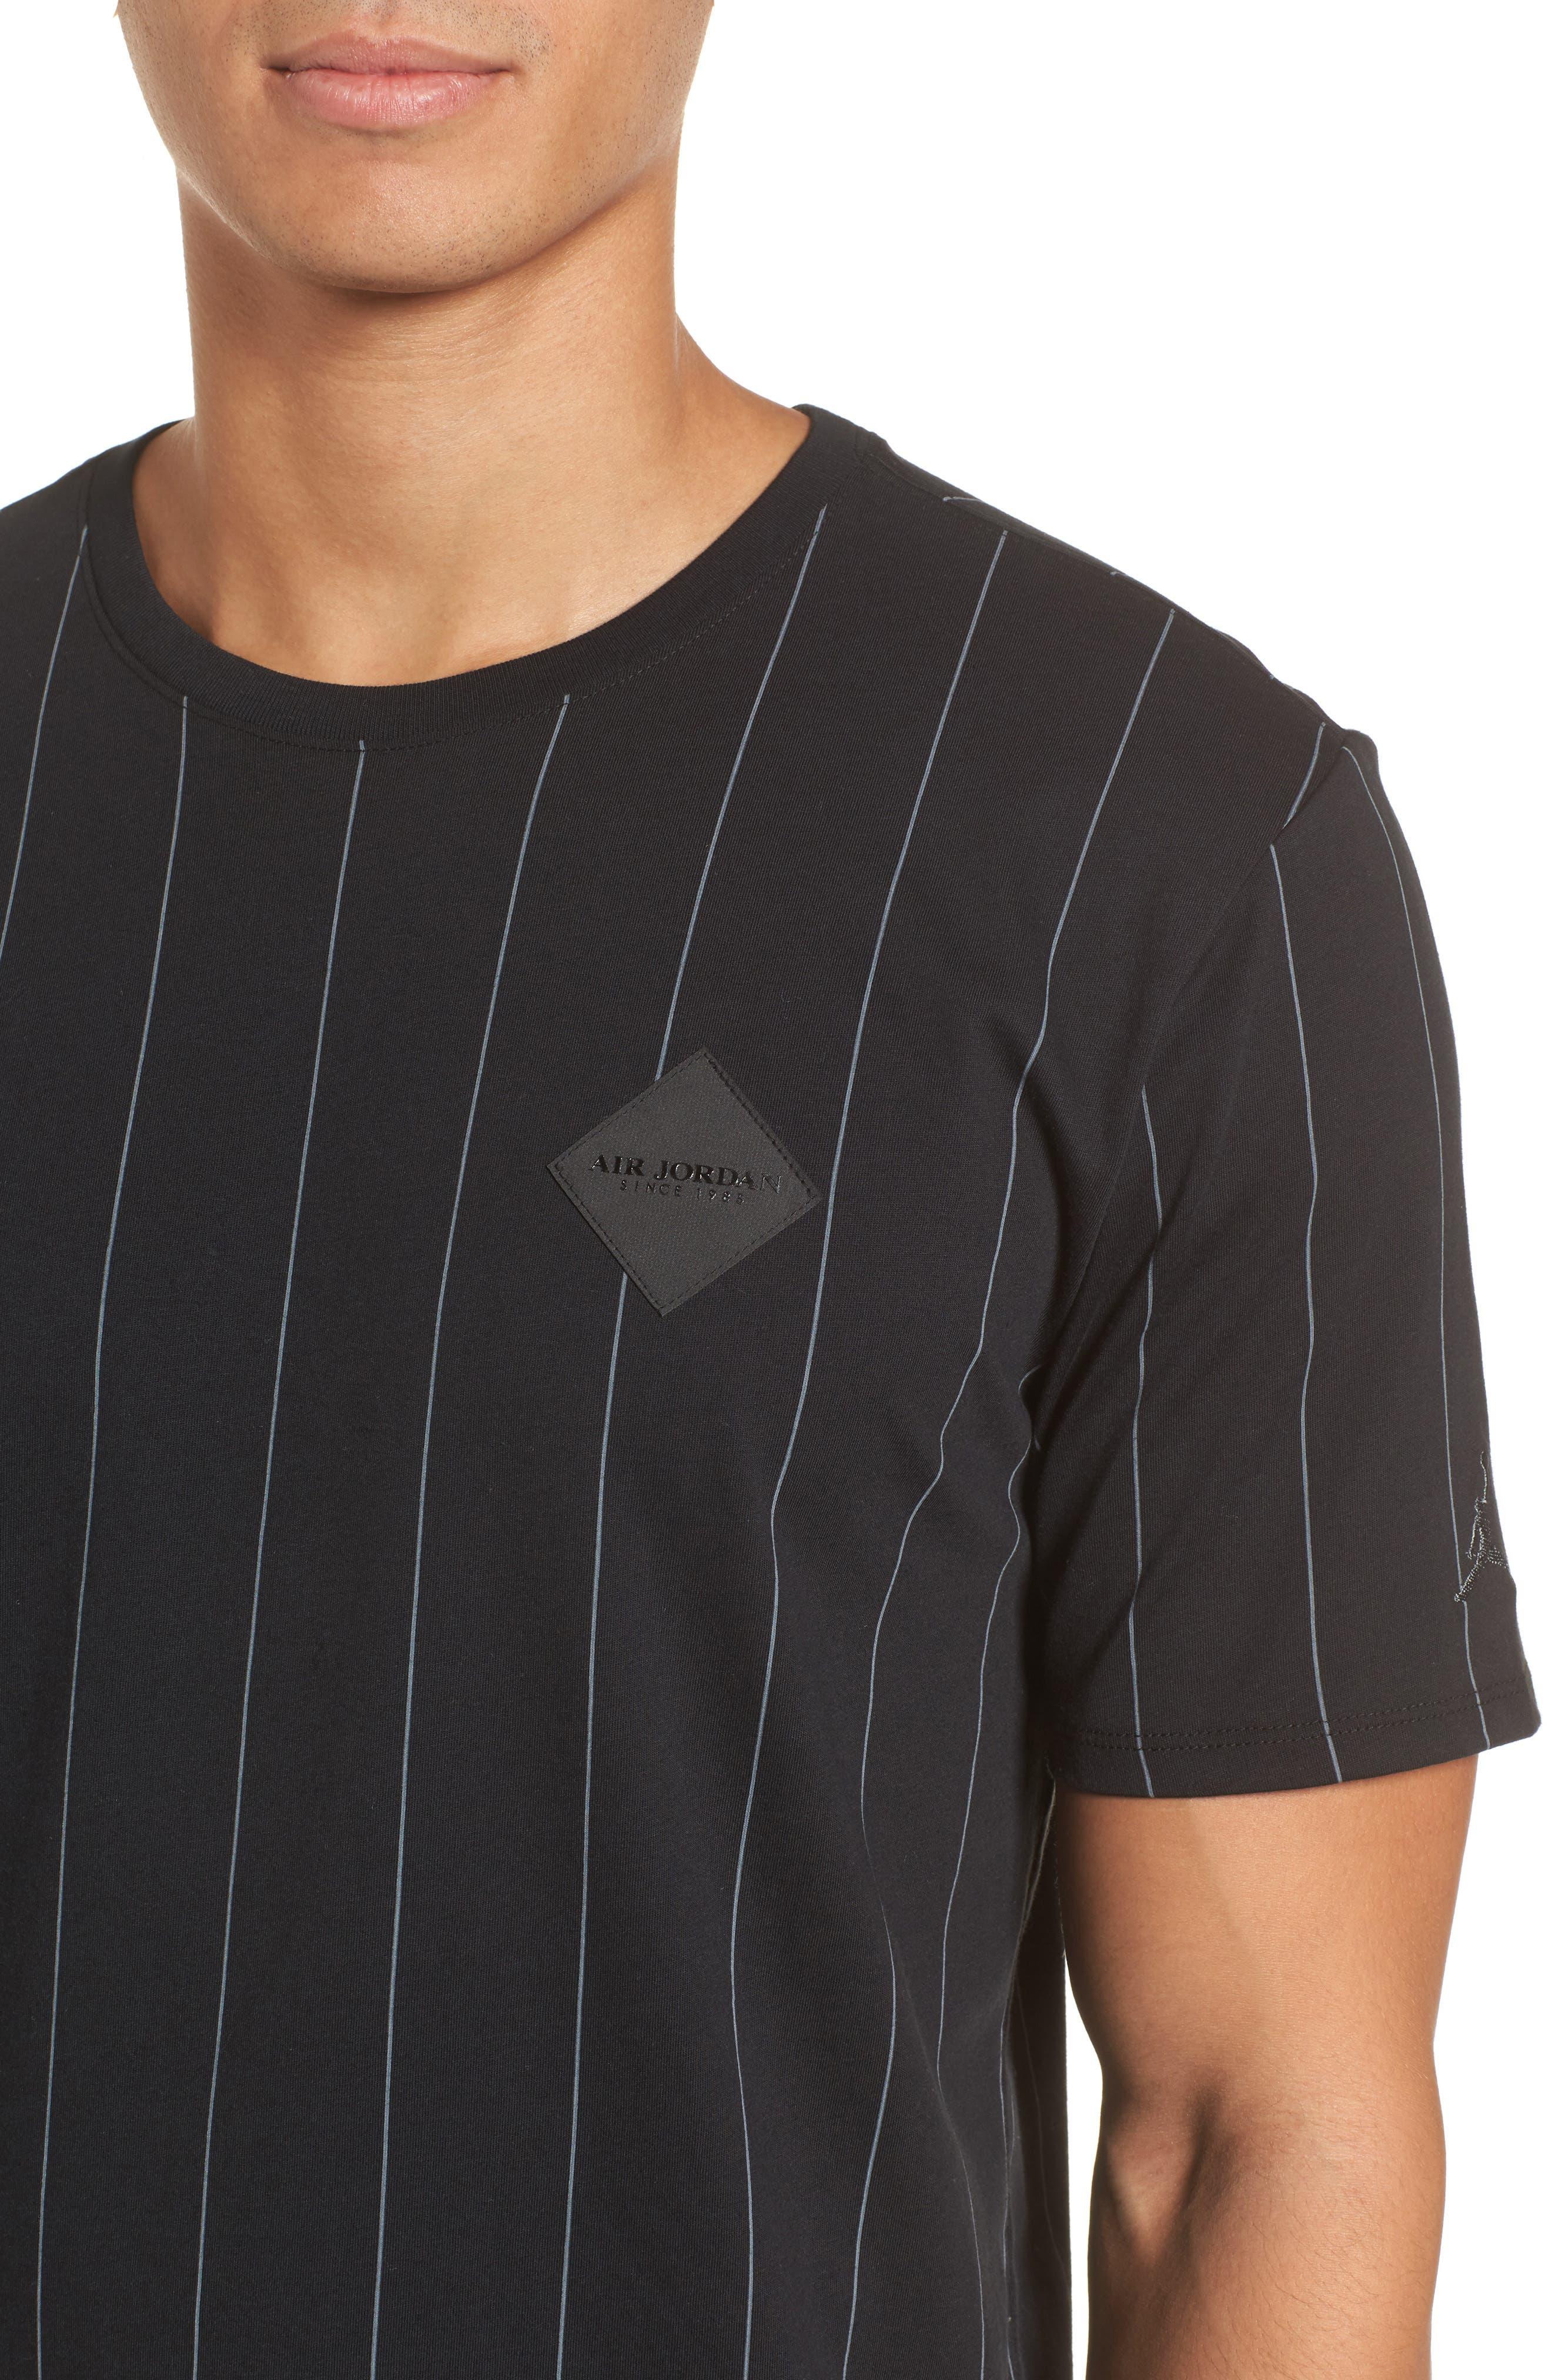 Sportswear AJ 9 T-Shirt,                             Alternate thumbnail 4, color,                             010